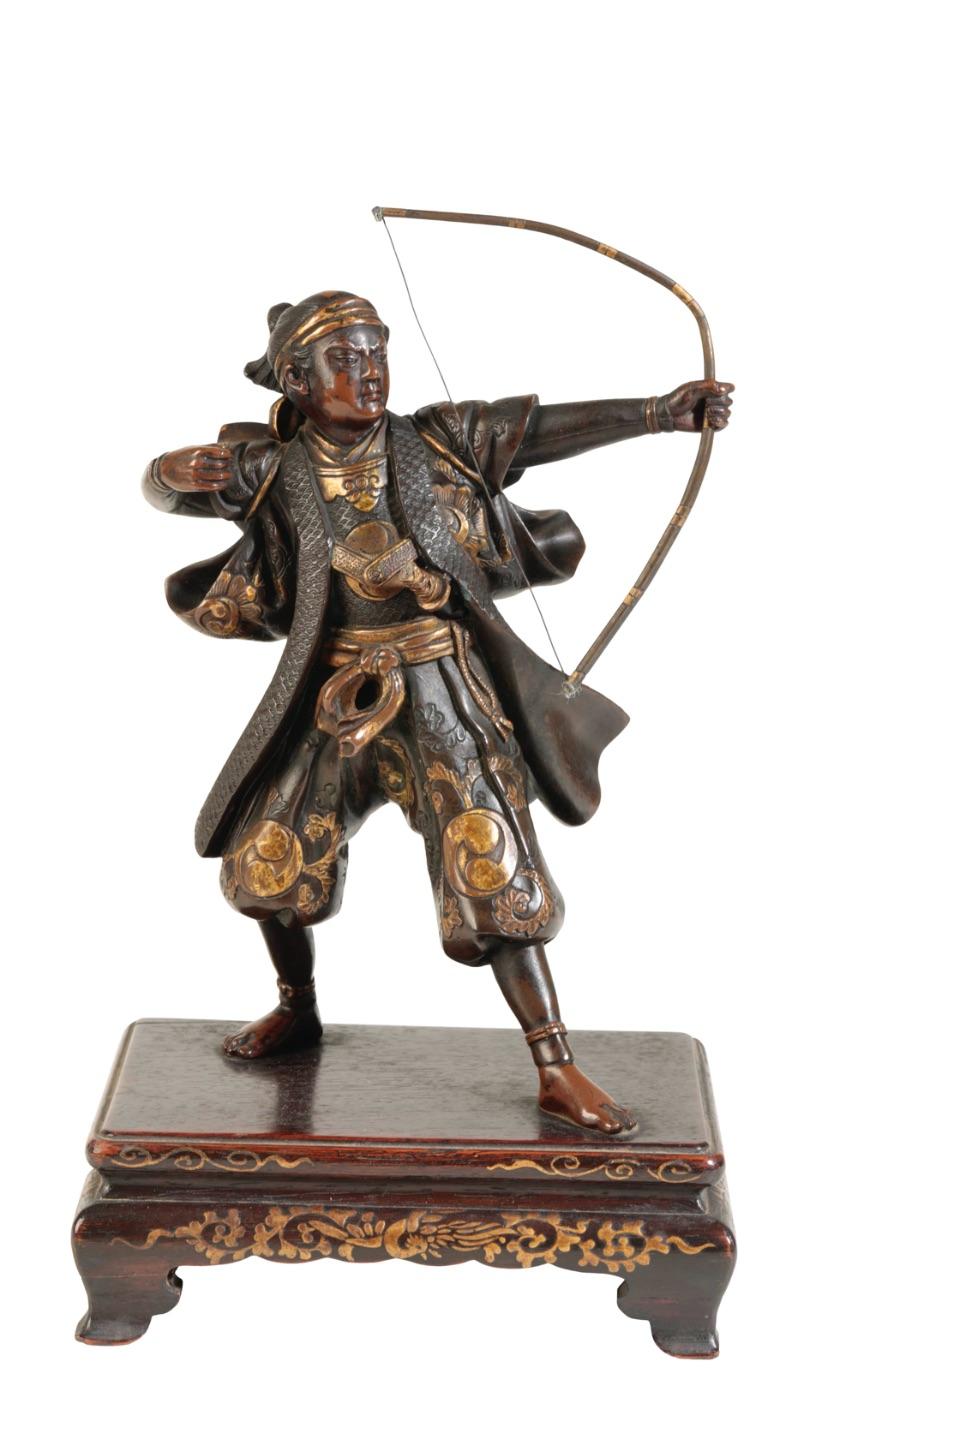 FINE JAPANESE MIXED METAL BRONZE FIGURE OF AN ARCHER, BY MIYAO EISUKE, MEIJI PERIOD